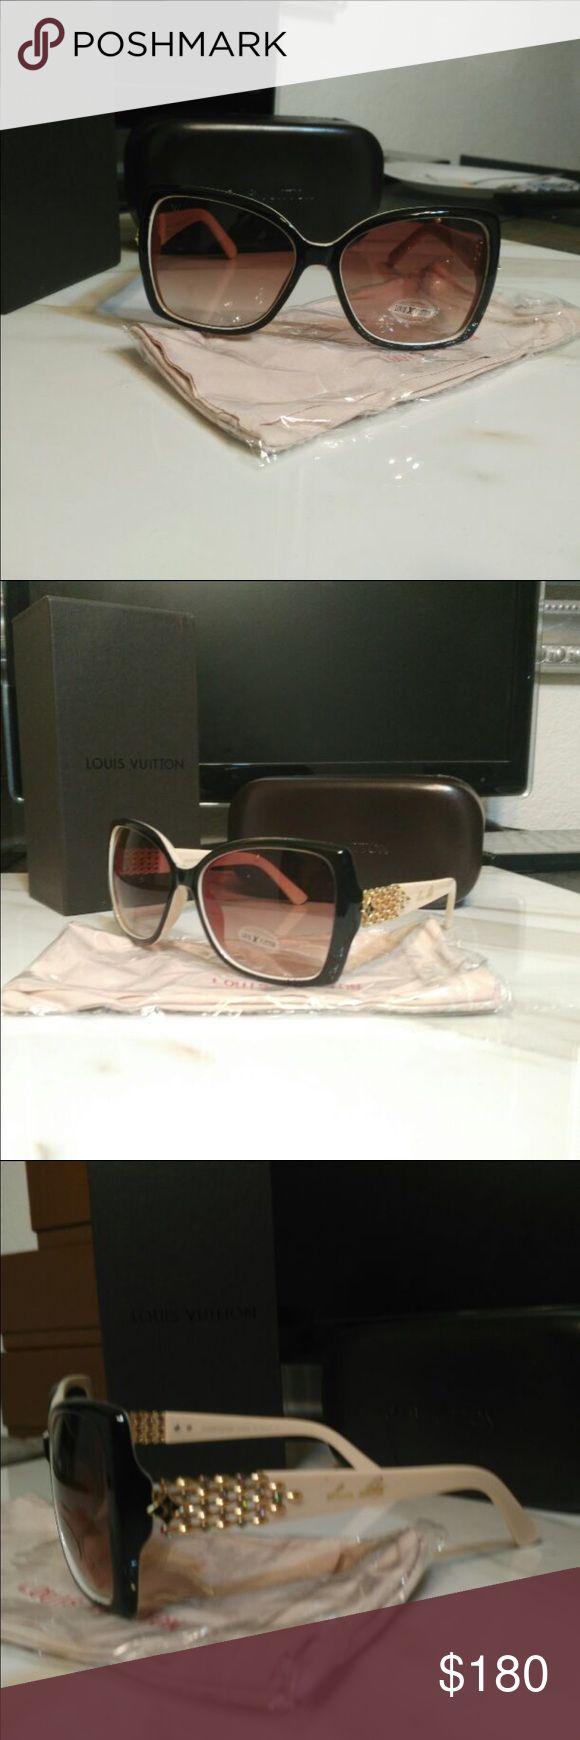 New Louis vuitton sunglasses Hi. I'm selling New Louis vuitton sunglasses look beautiful Louis Vuitton Accessories Sunglasses